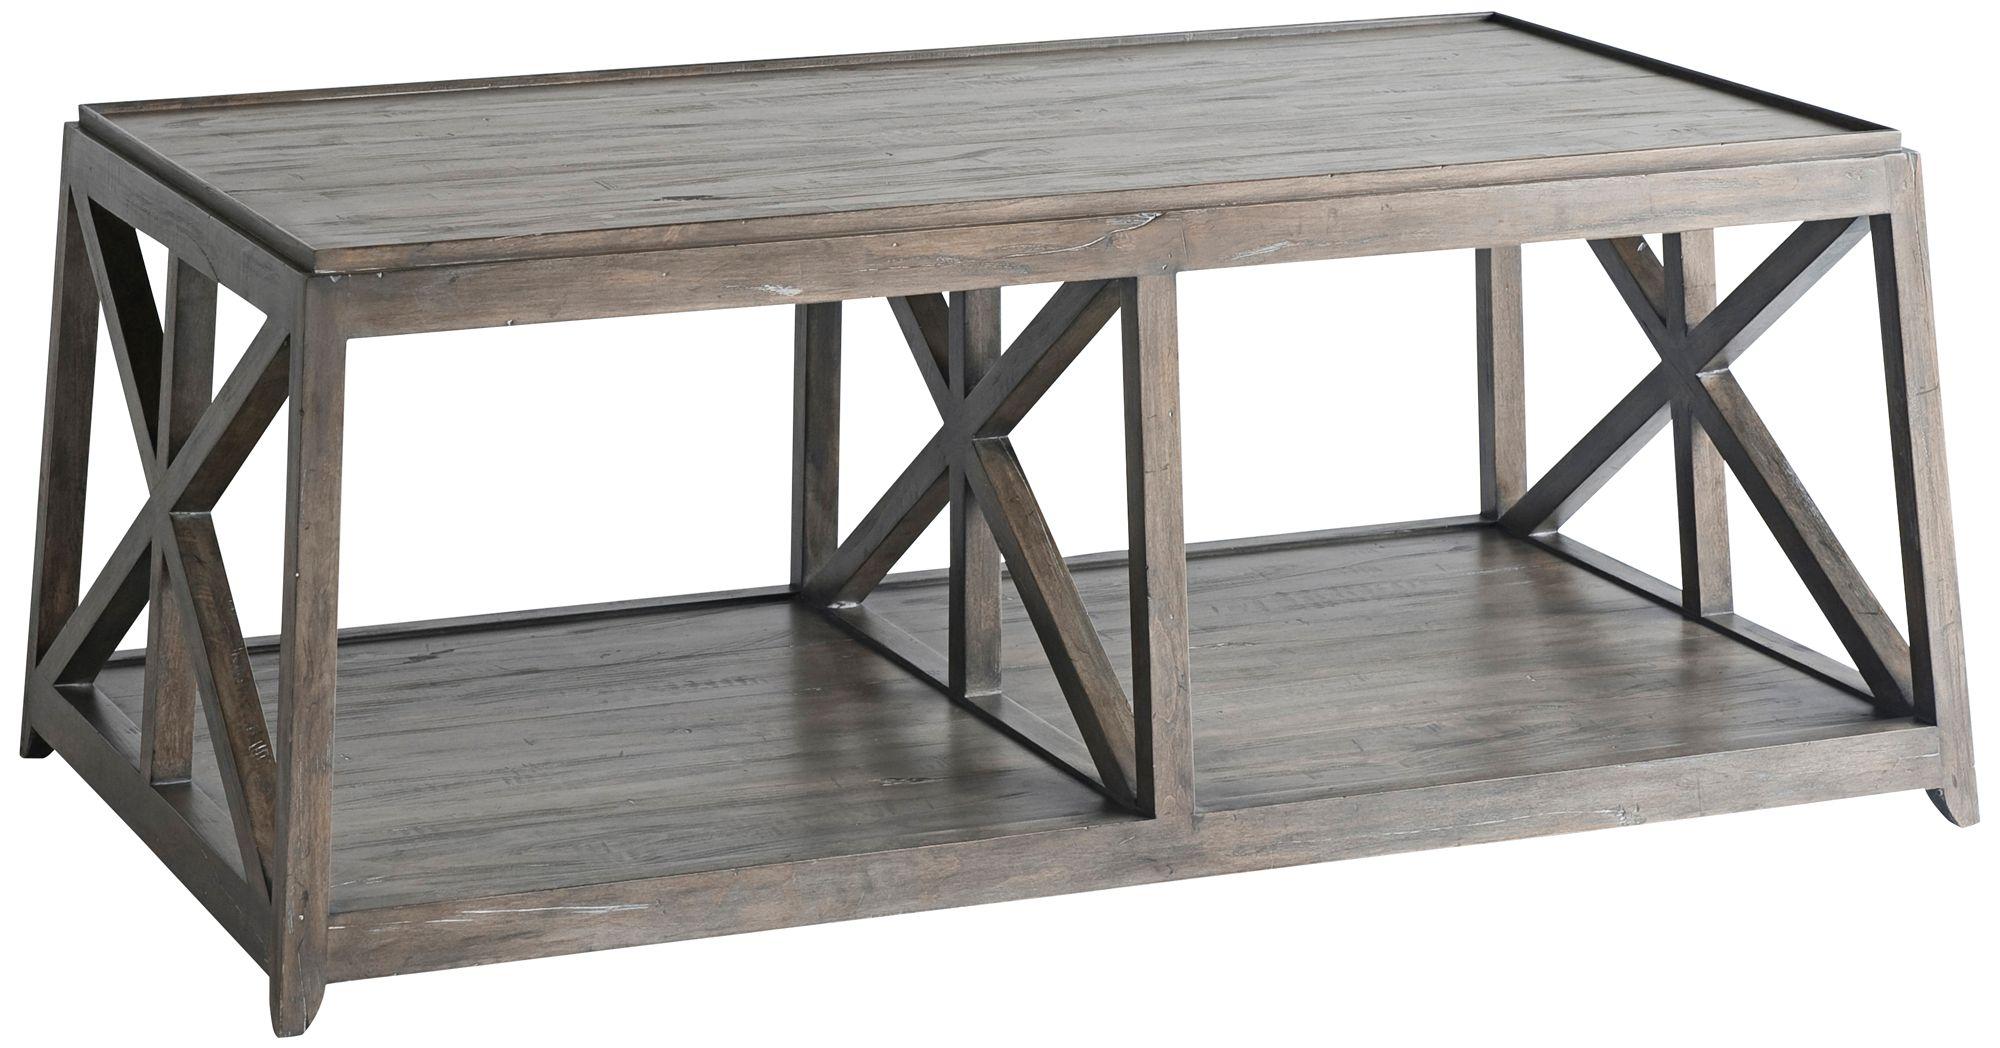 Laidley NoDa Cocoa Wood Coffee Table